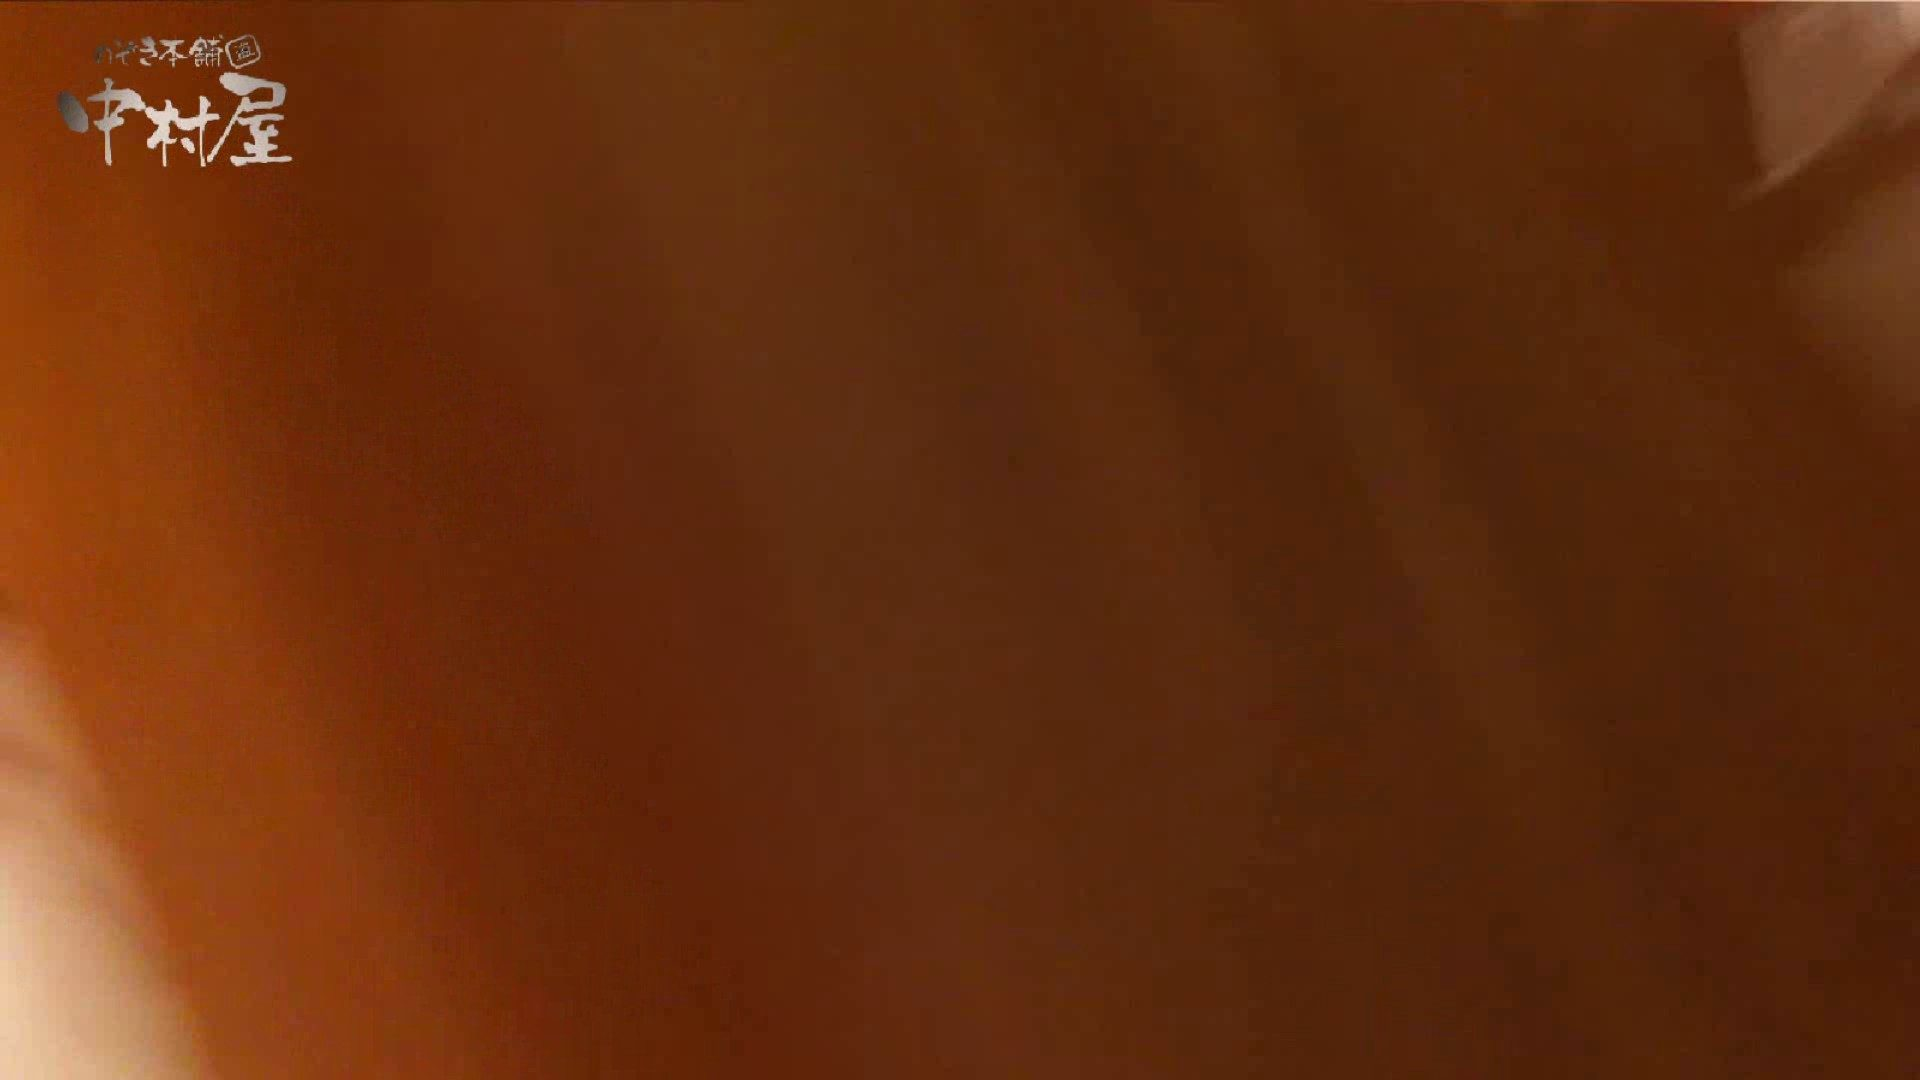 vol.84 美人アパレル胸チラ&パンチラ 帽子オネェさんに胸元アタック! 接写  94連発 24